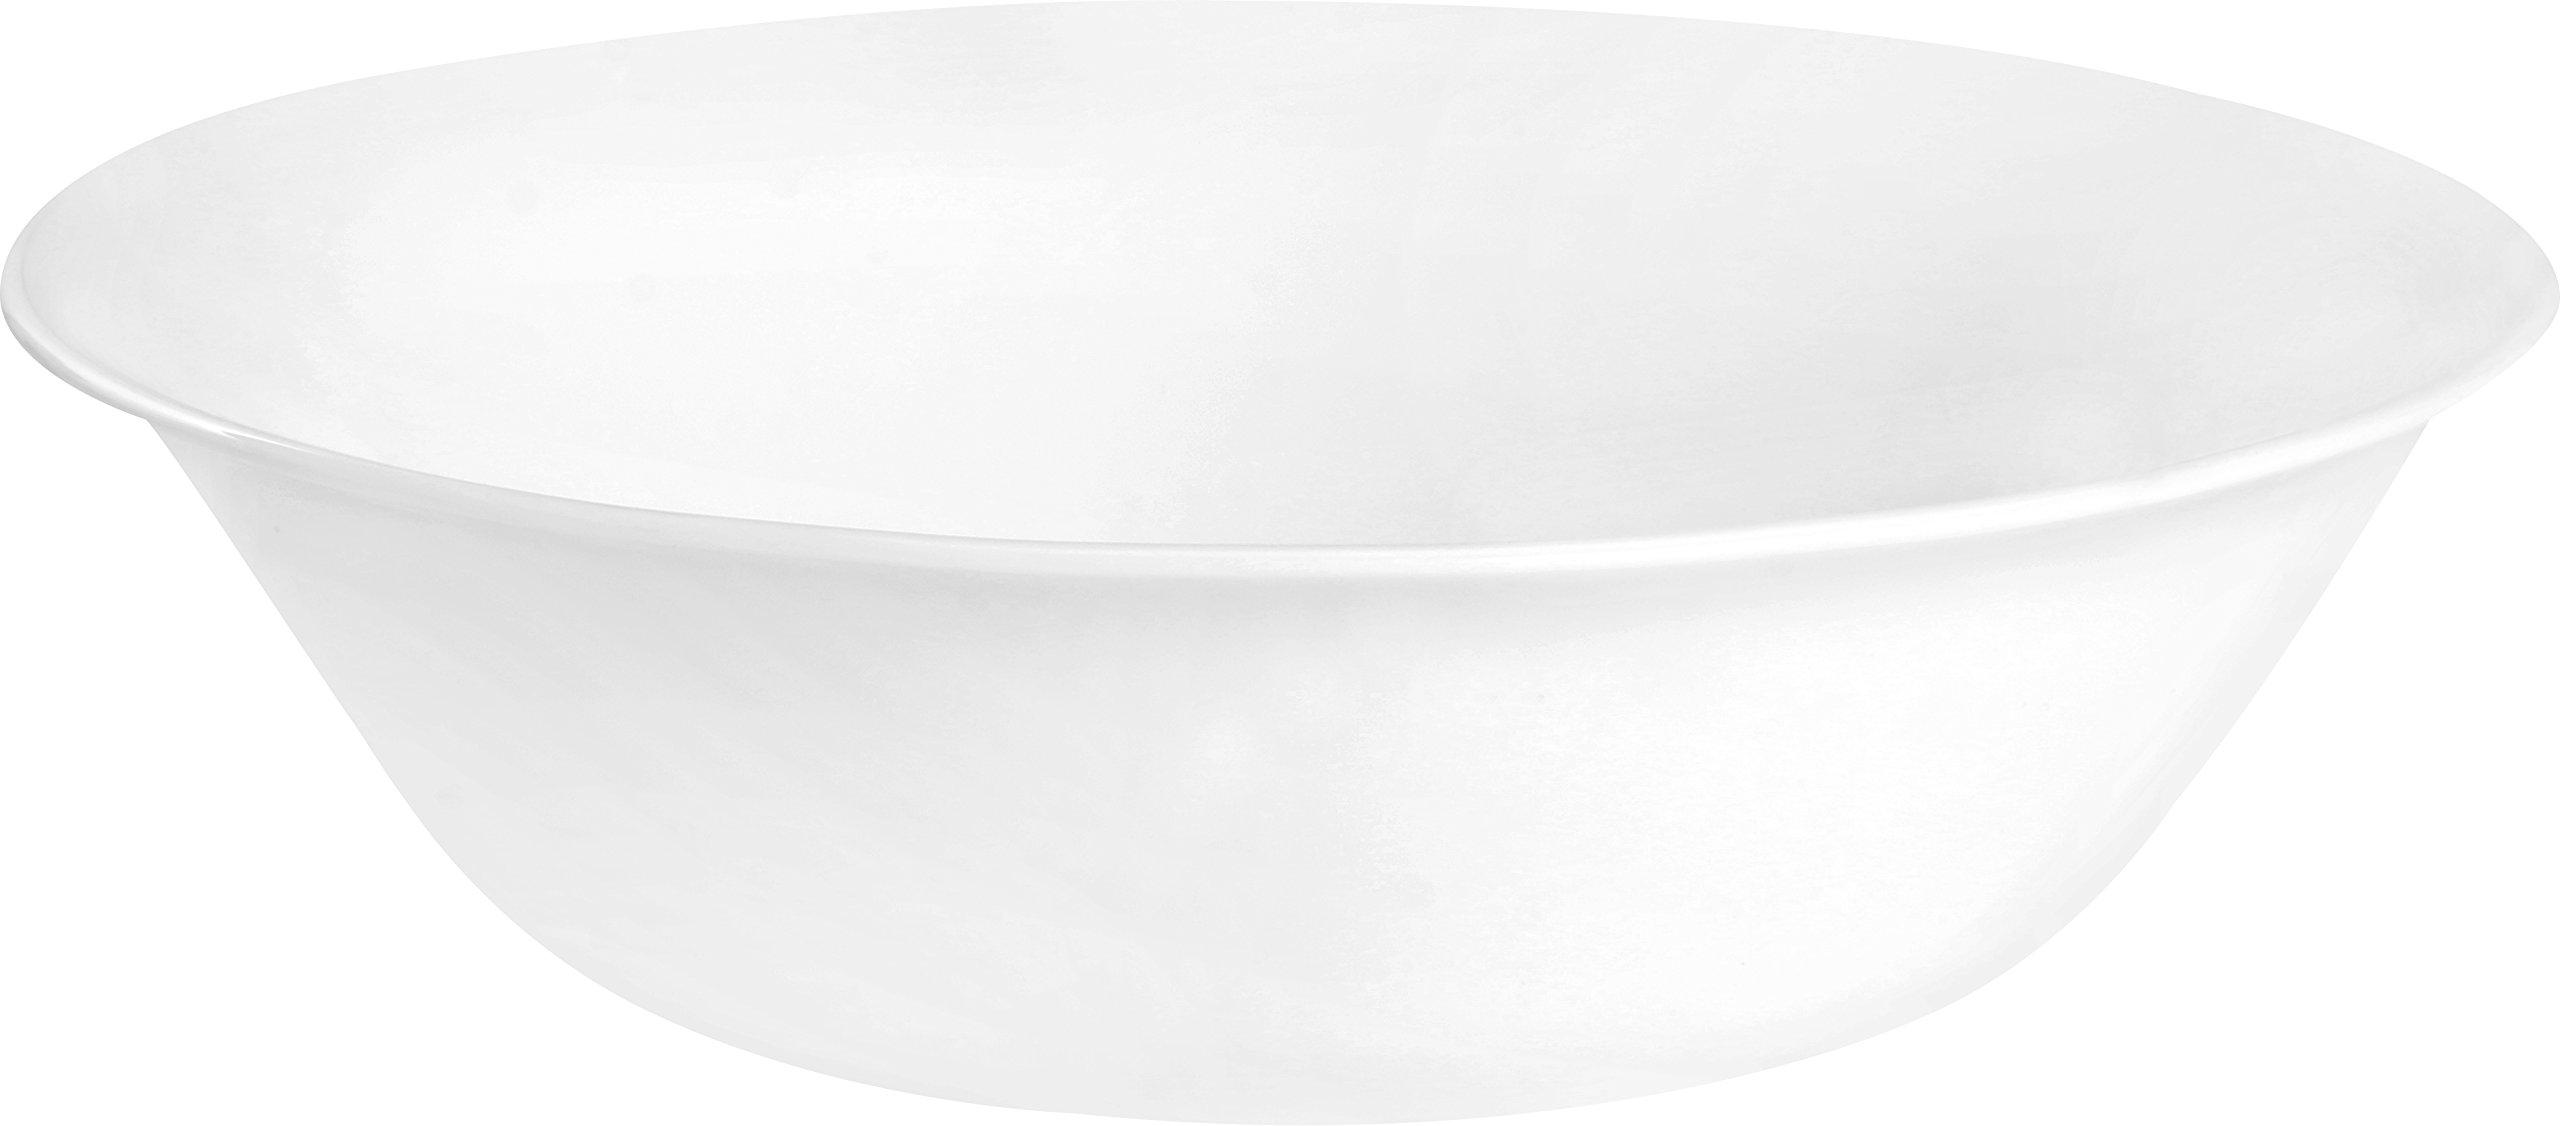 Utopia Kitchen 6 Pieces Bowl Set - Dishwasher Safe Opal Glassware - Microwave/Oven Friendly by Utopia Kitchen (Image #4)